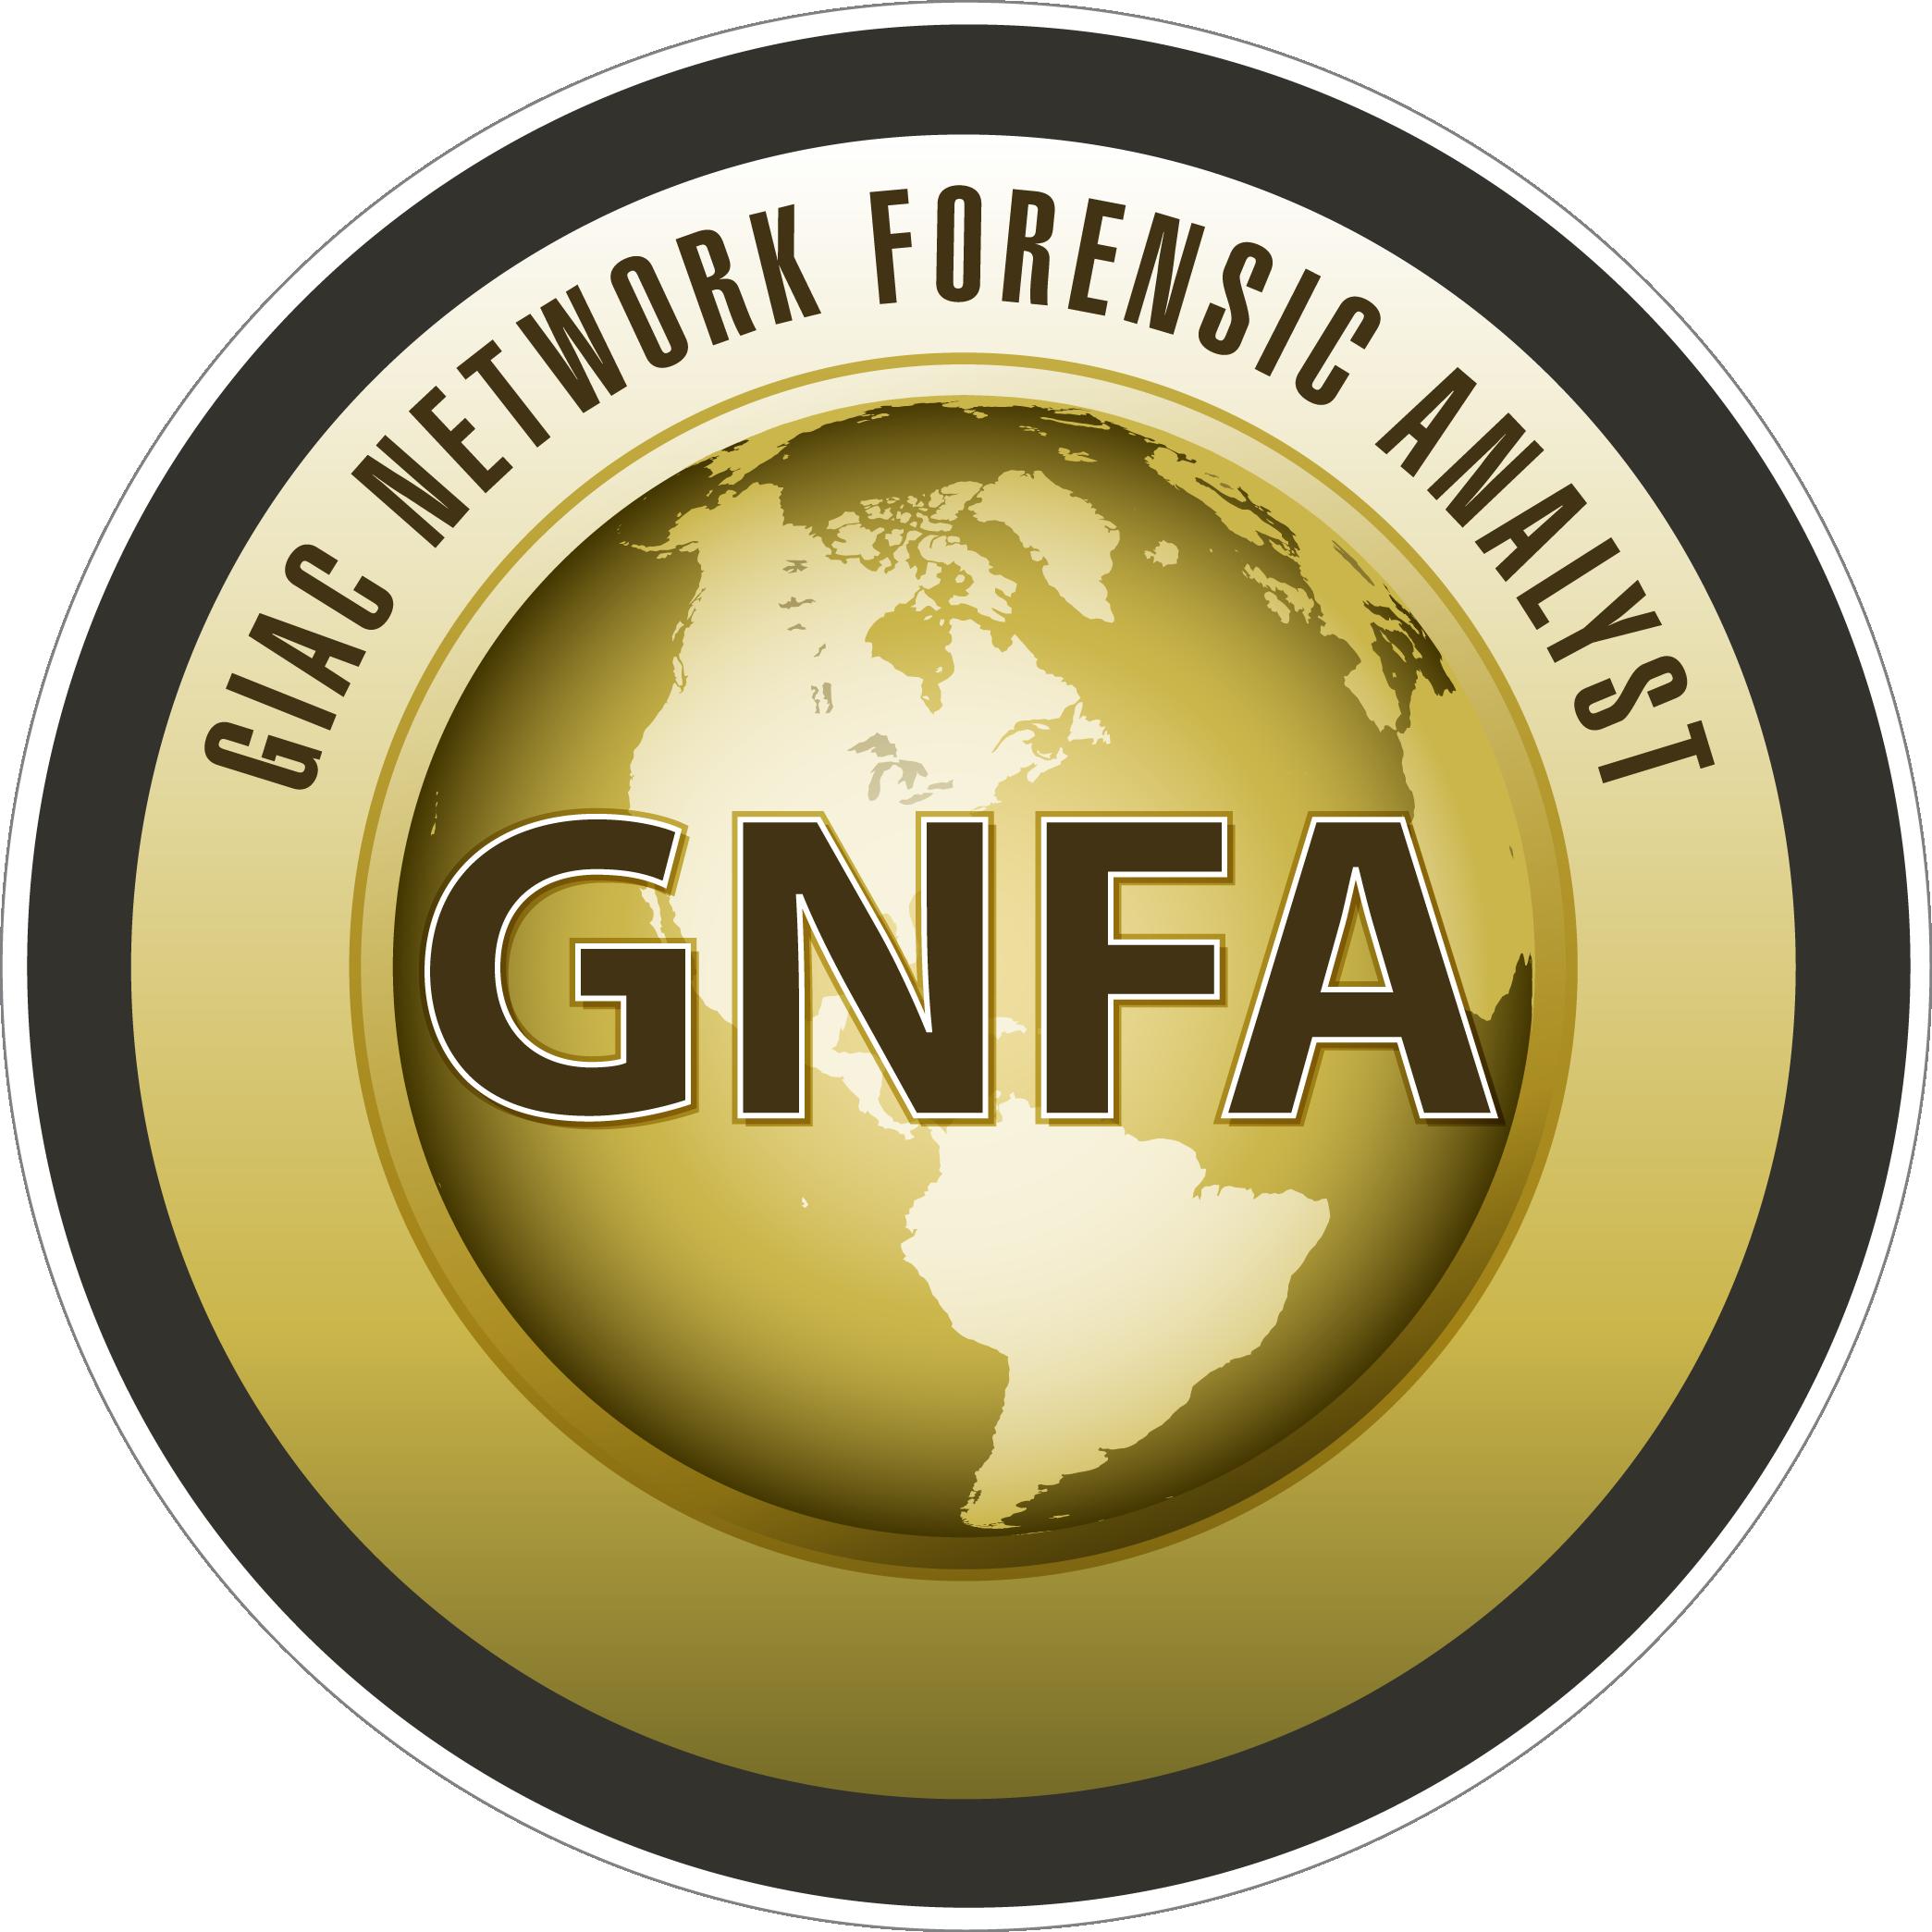 GIAC Network Forensic Analyst (GNFA) icon